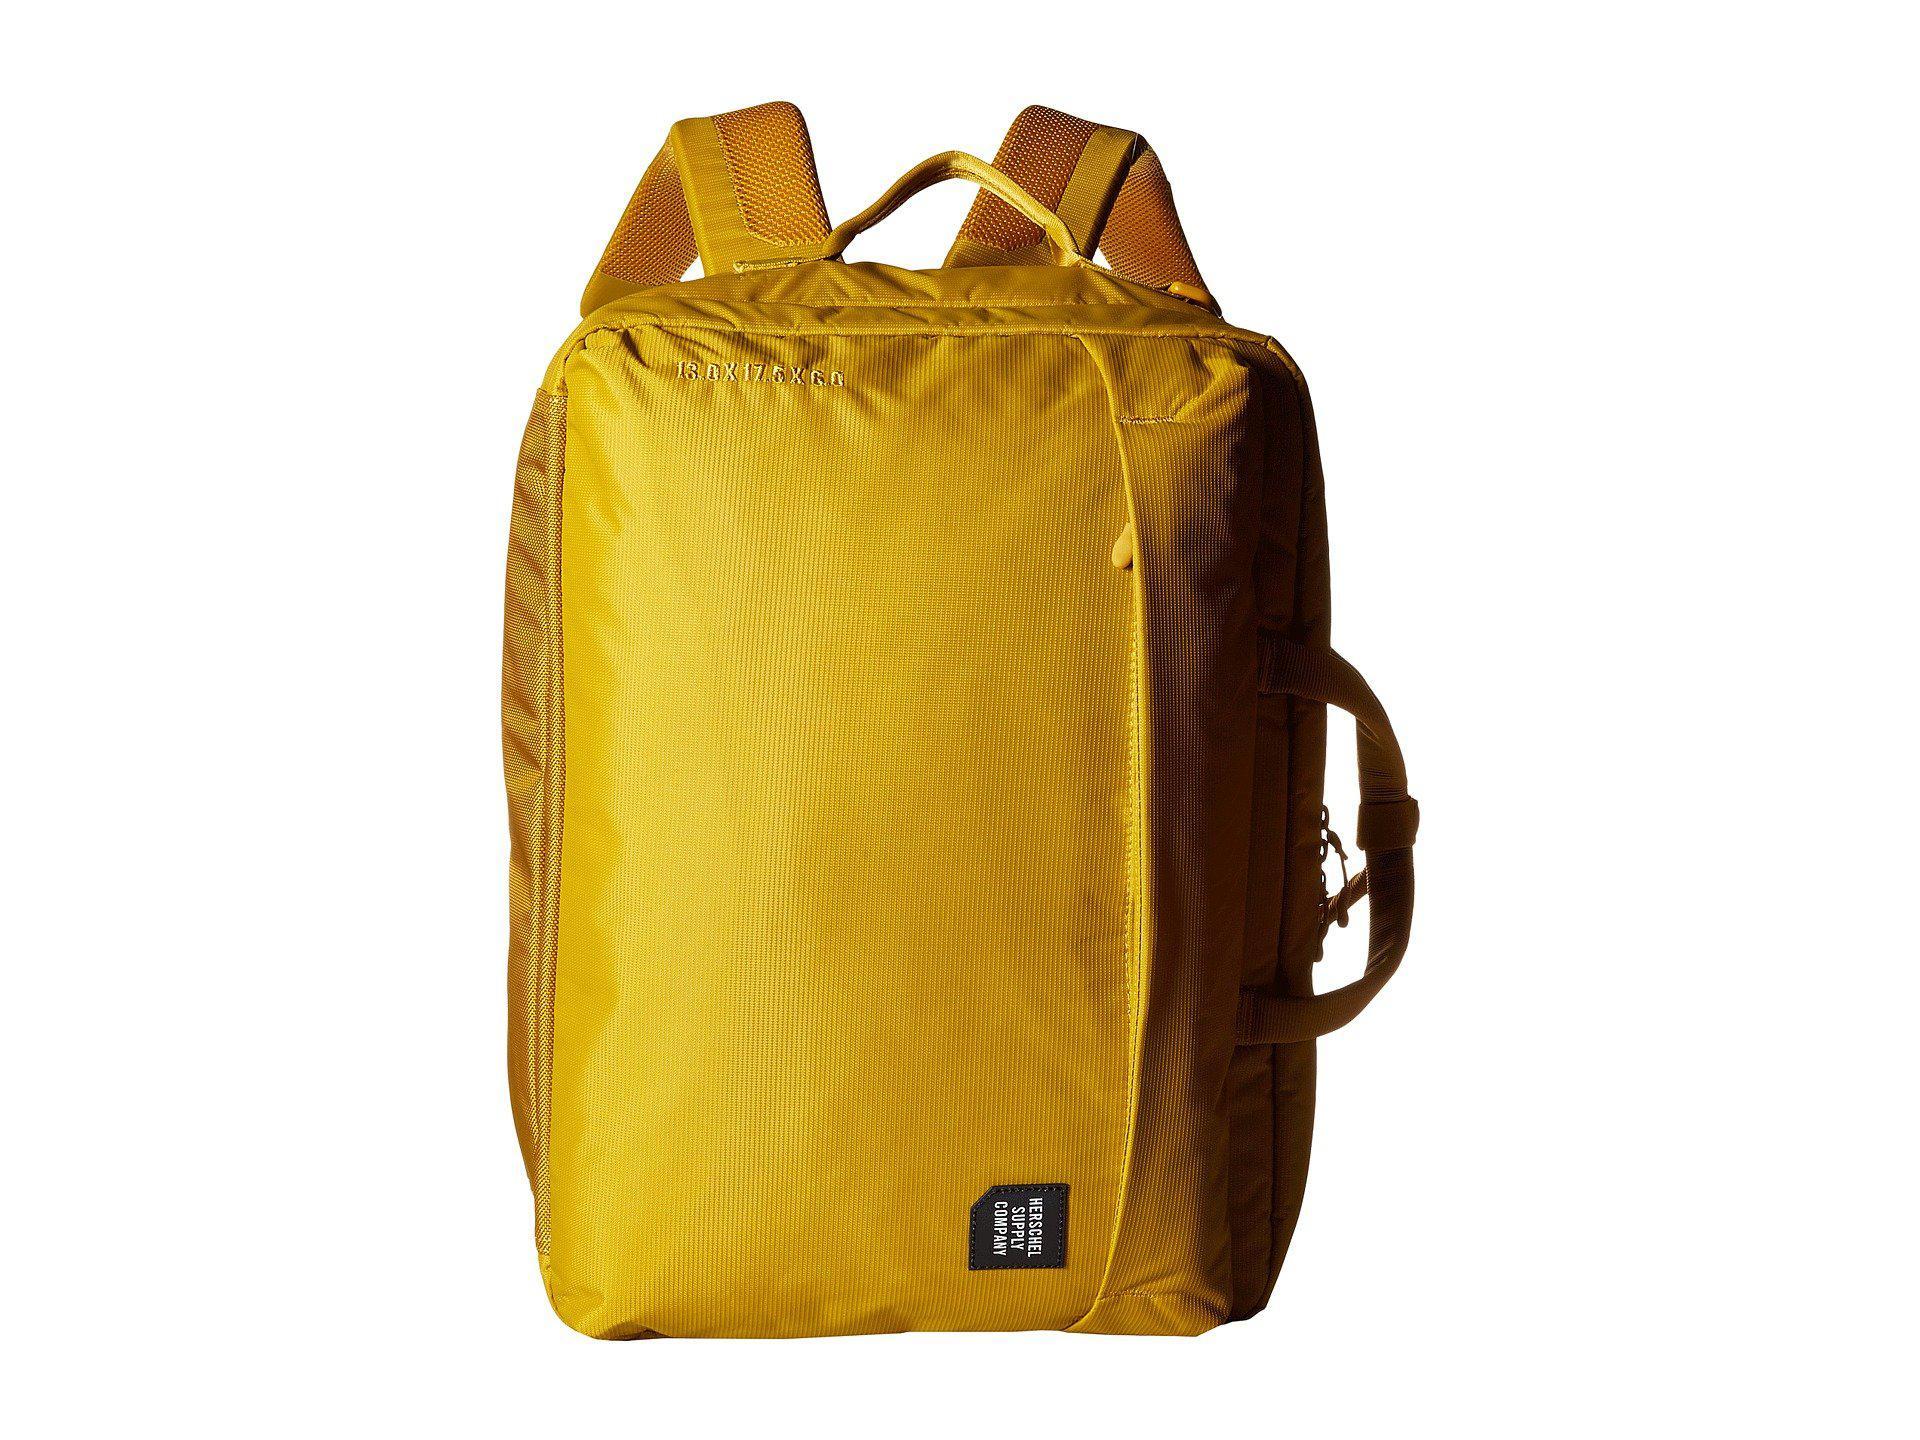 eae09e707e4 Herschel Supply Co. Men s Yellow Britannia Xl (arrowwood) Messenger Bags